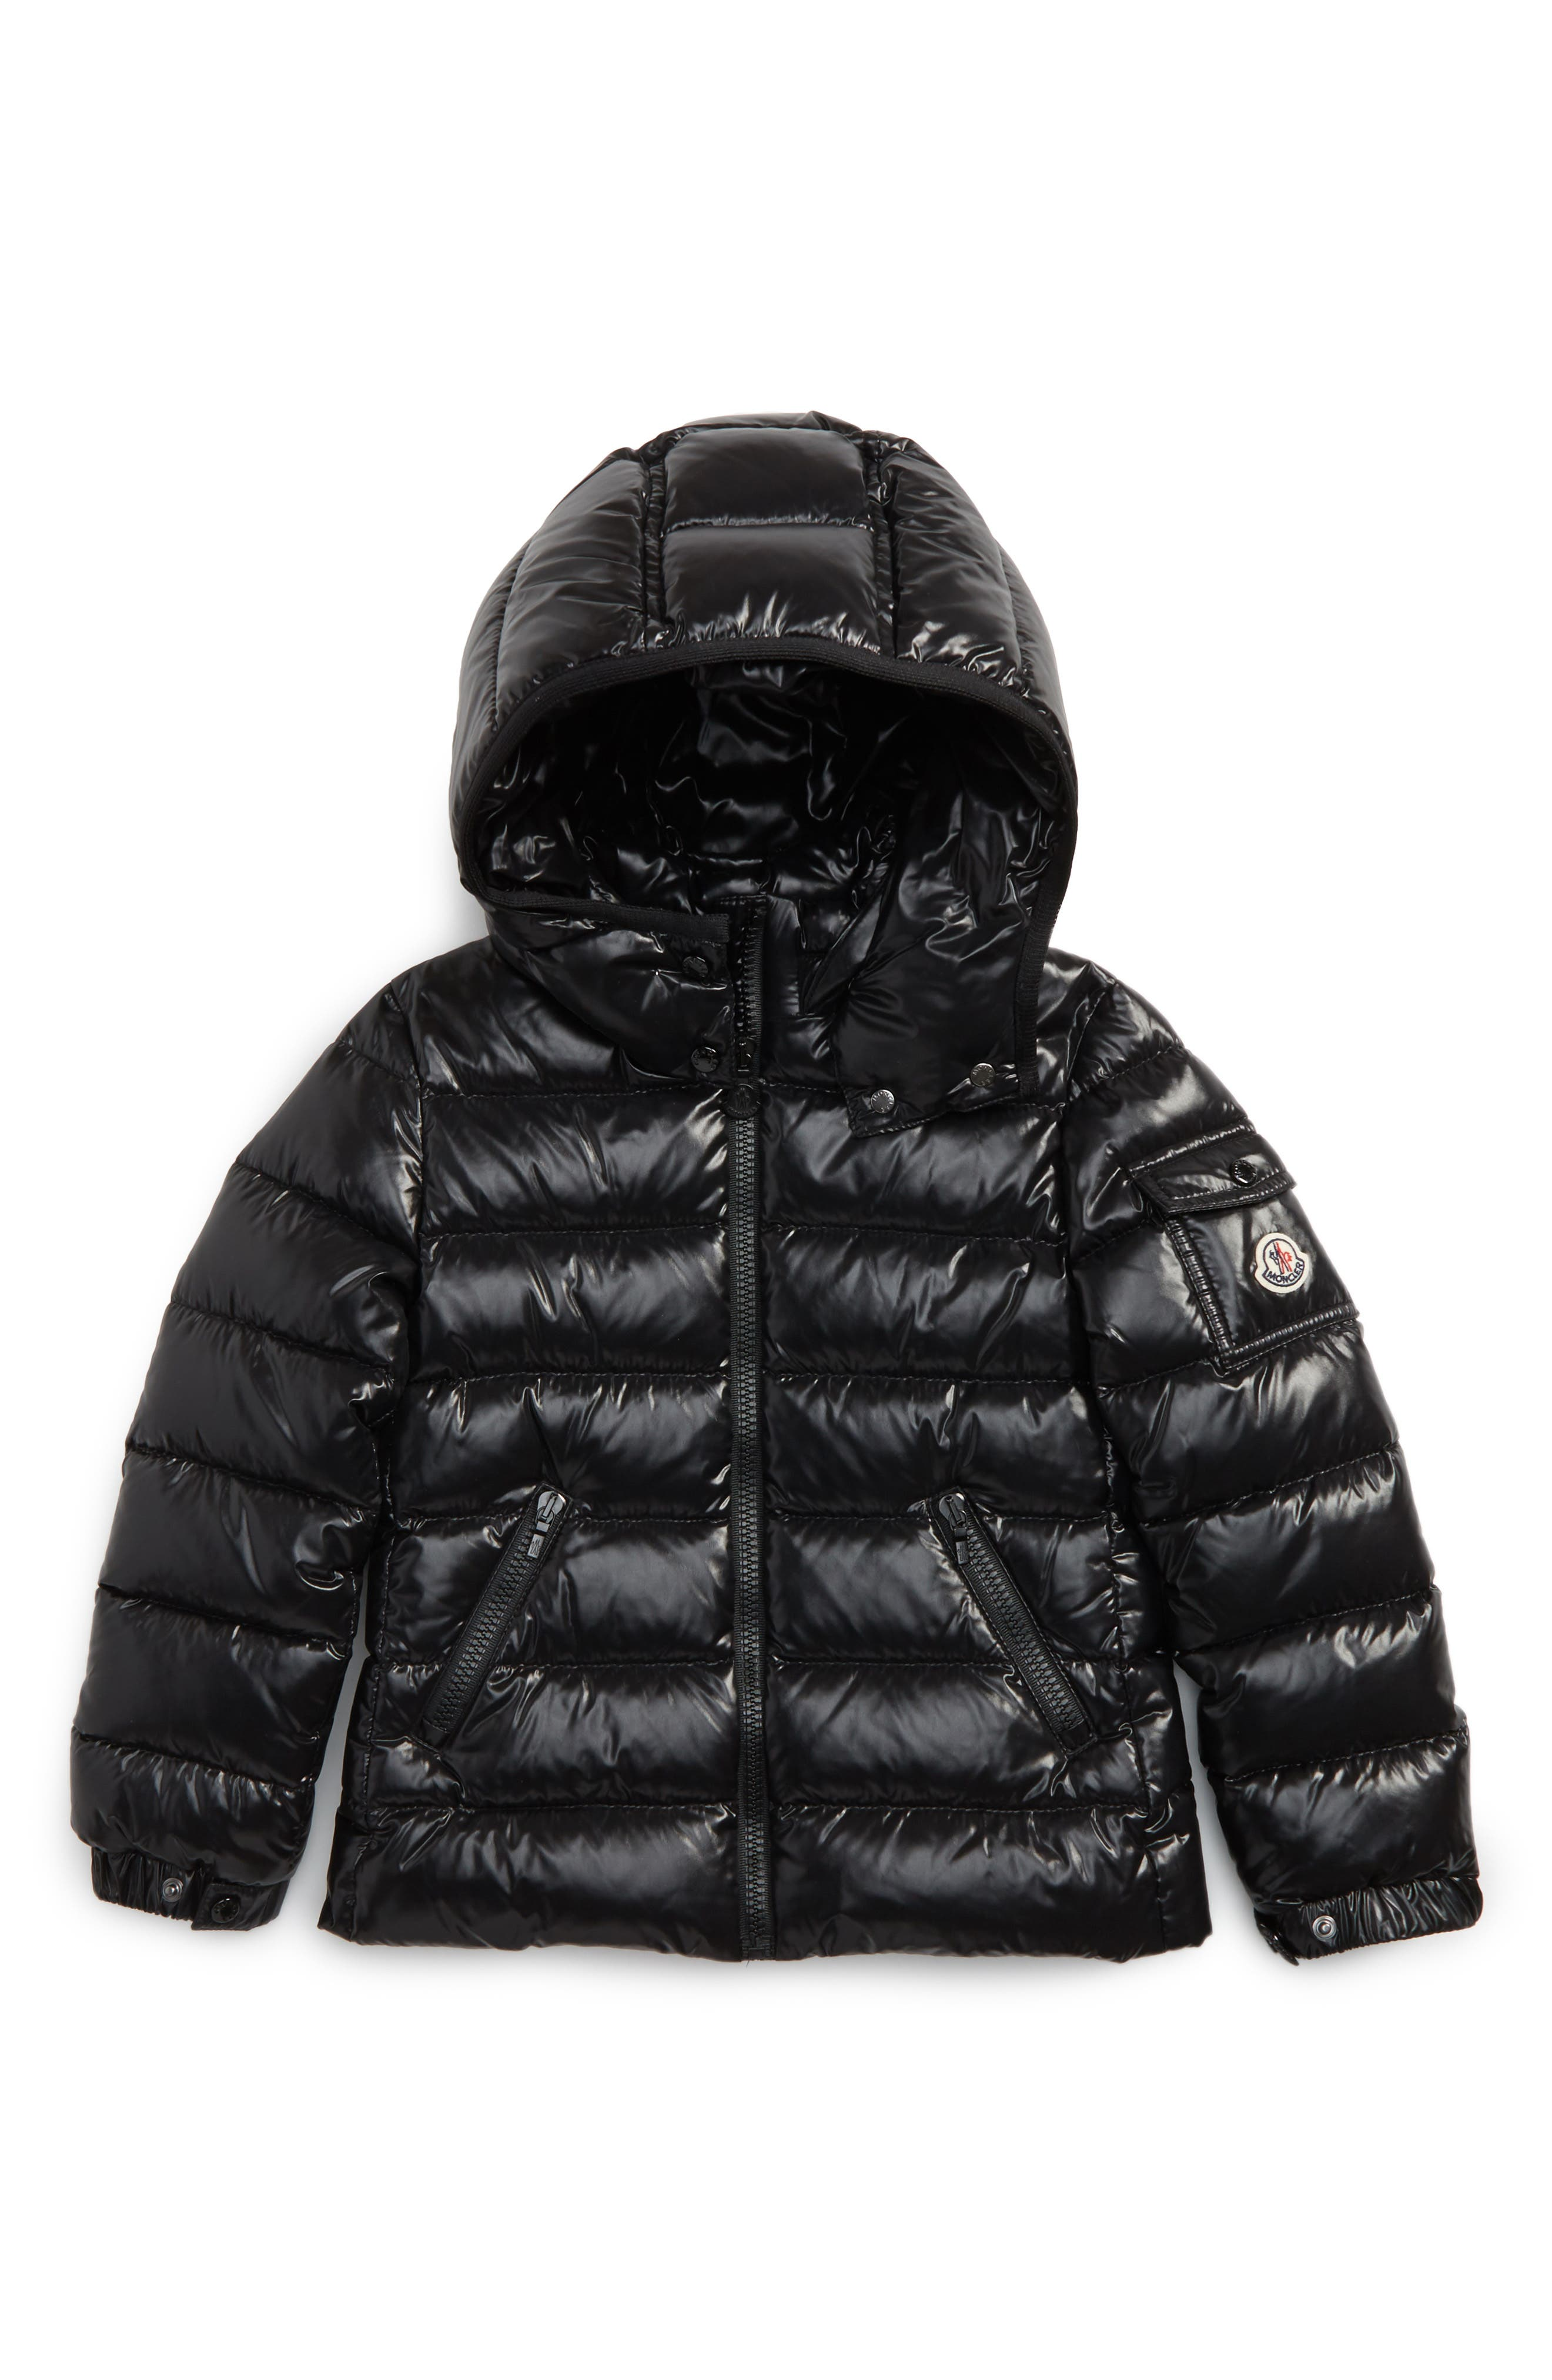 Alternate Image 1 Selected - Moncler Bady Hooded Down Jacket (Toddler Girls, Little Girls & Big Girls)